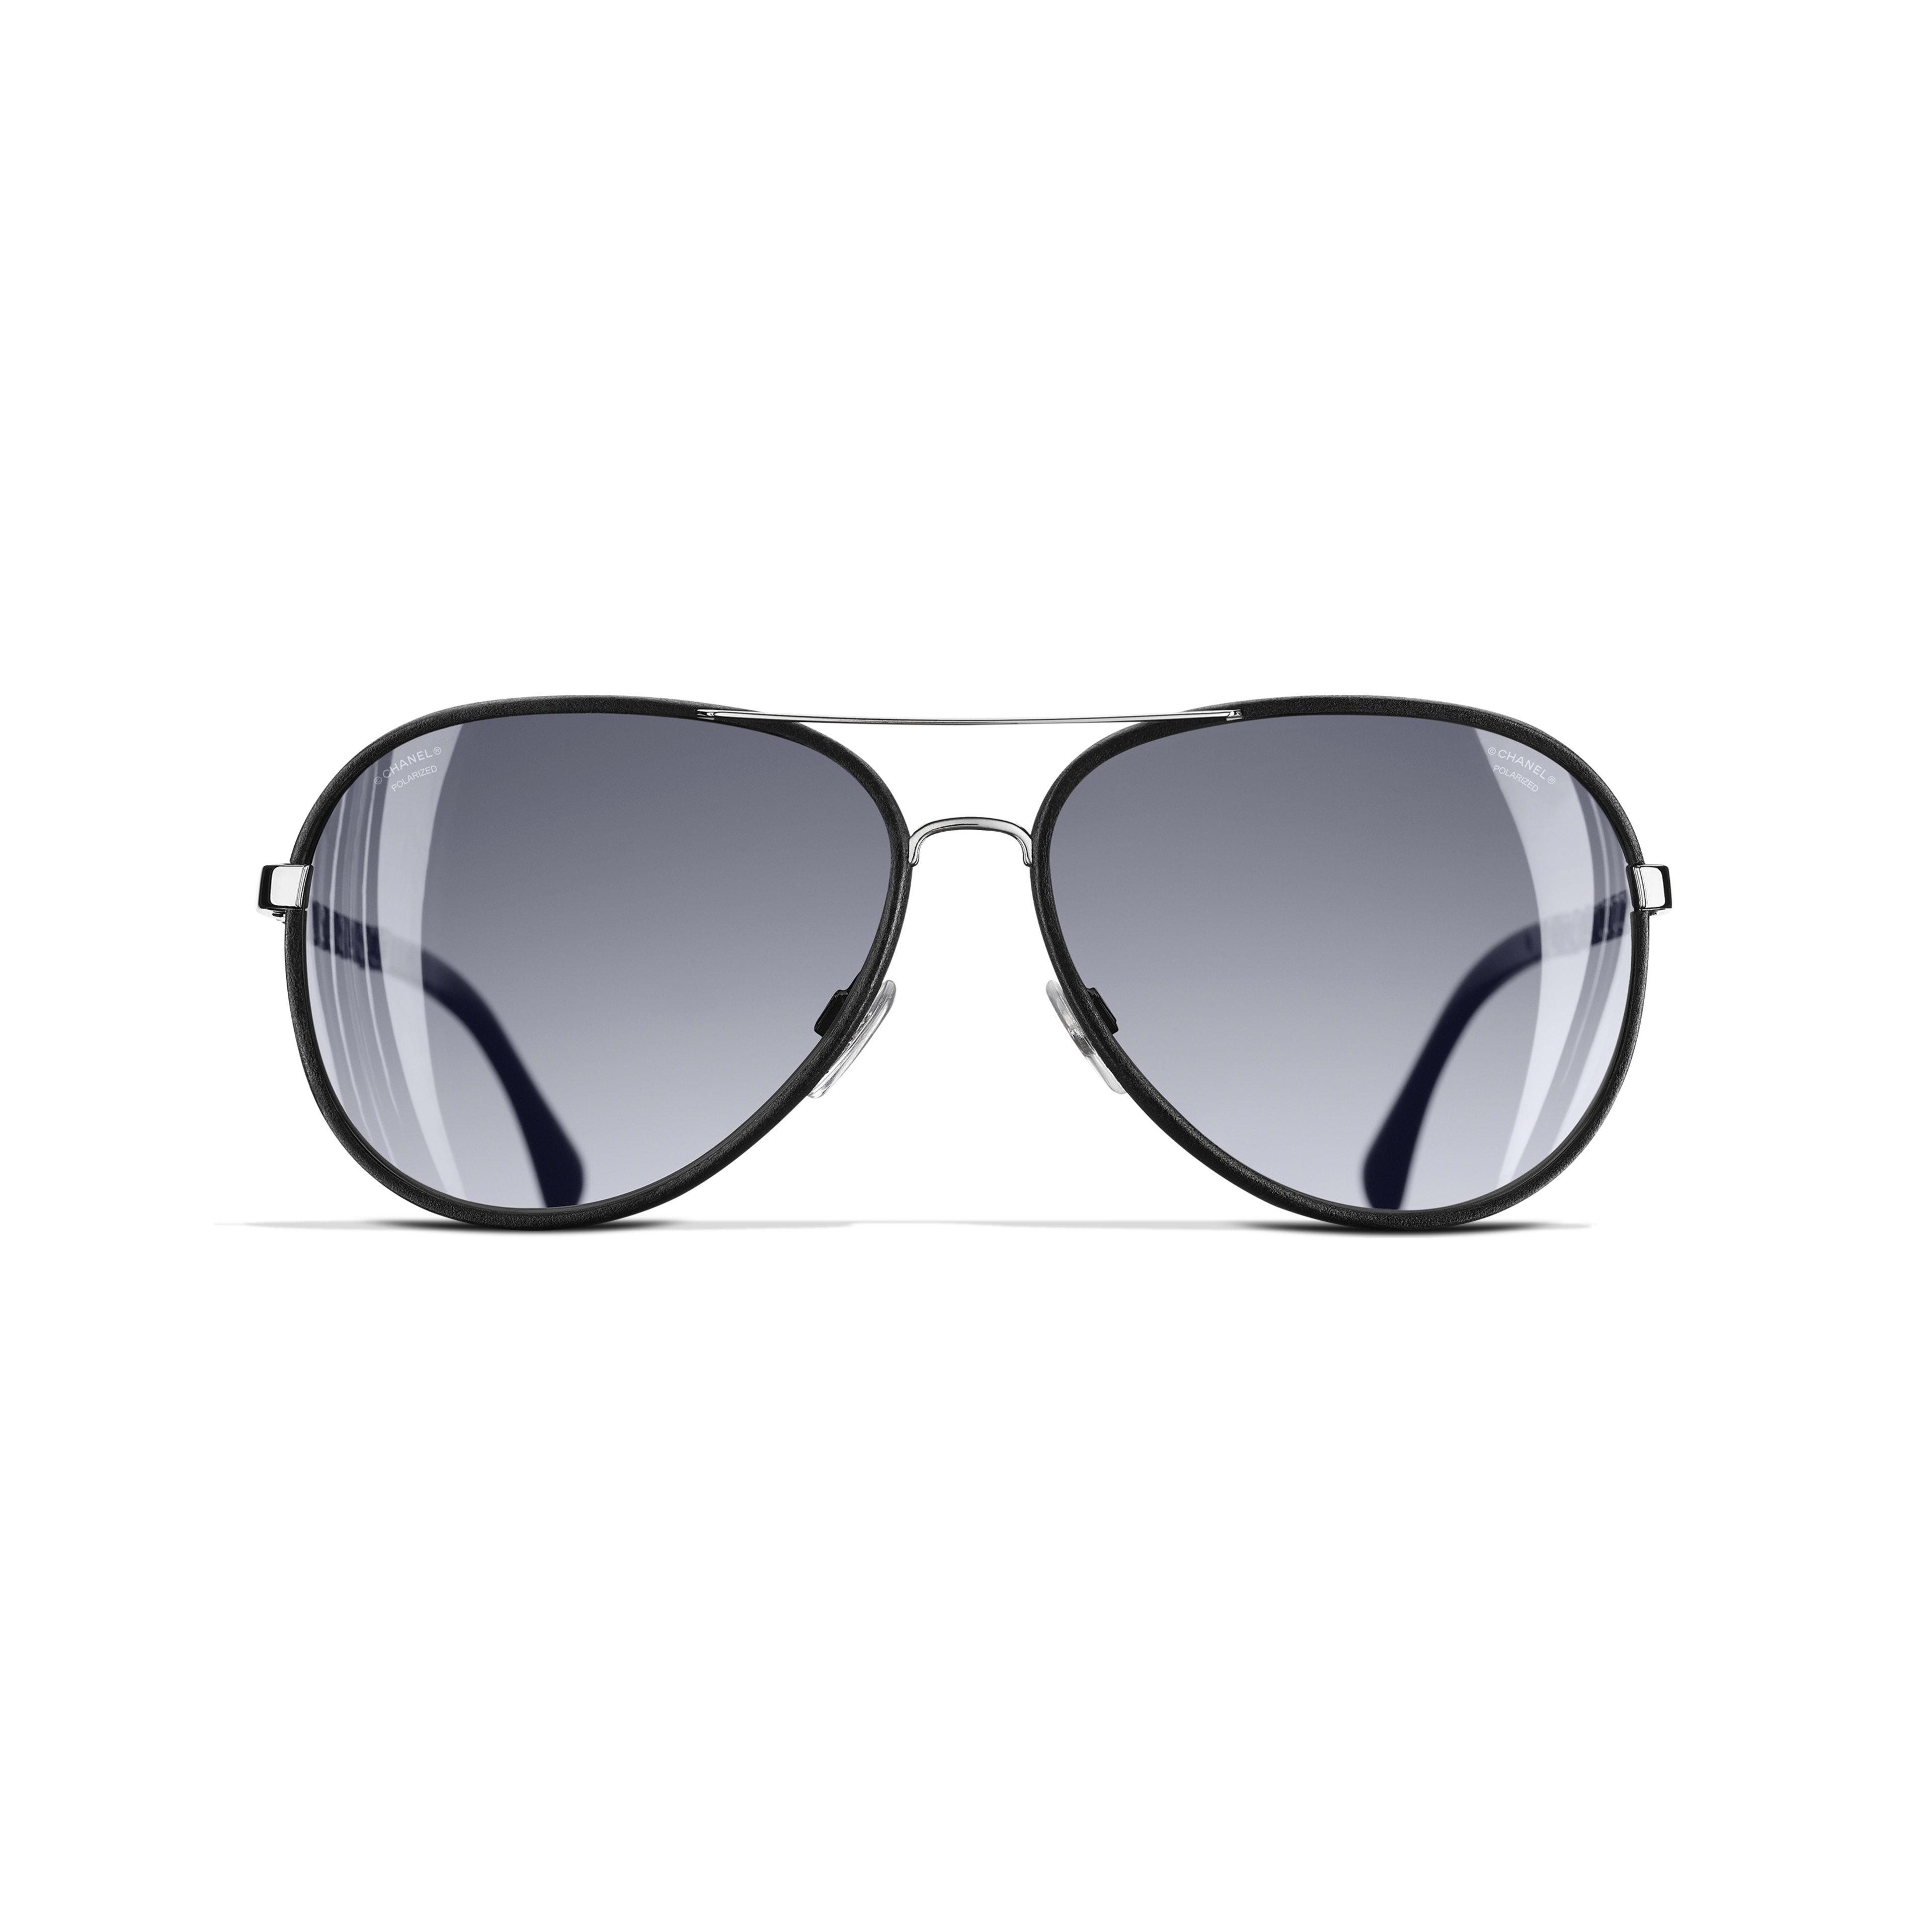 Pilot Sunglasses - Black - Metal & Calfskin - Polarized Lenses - Alternative view - see standard sized version